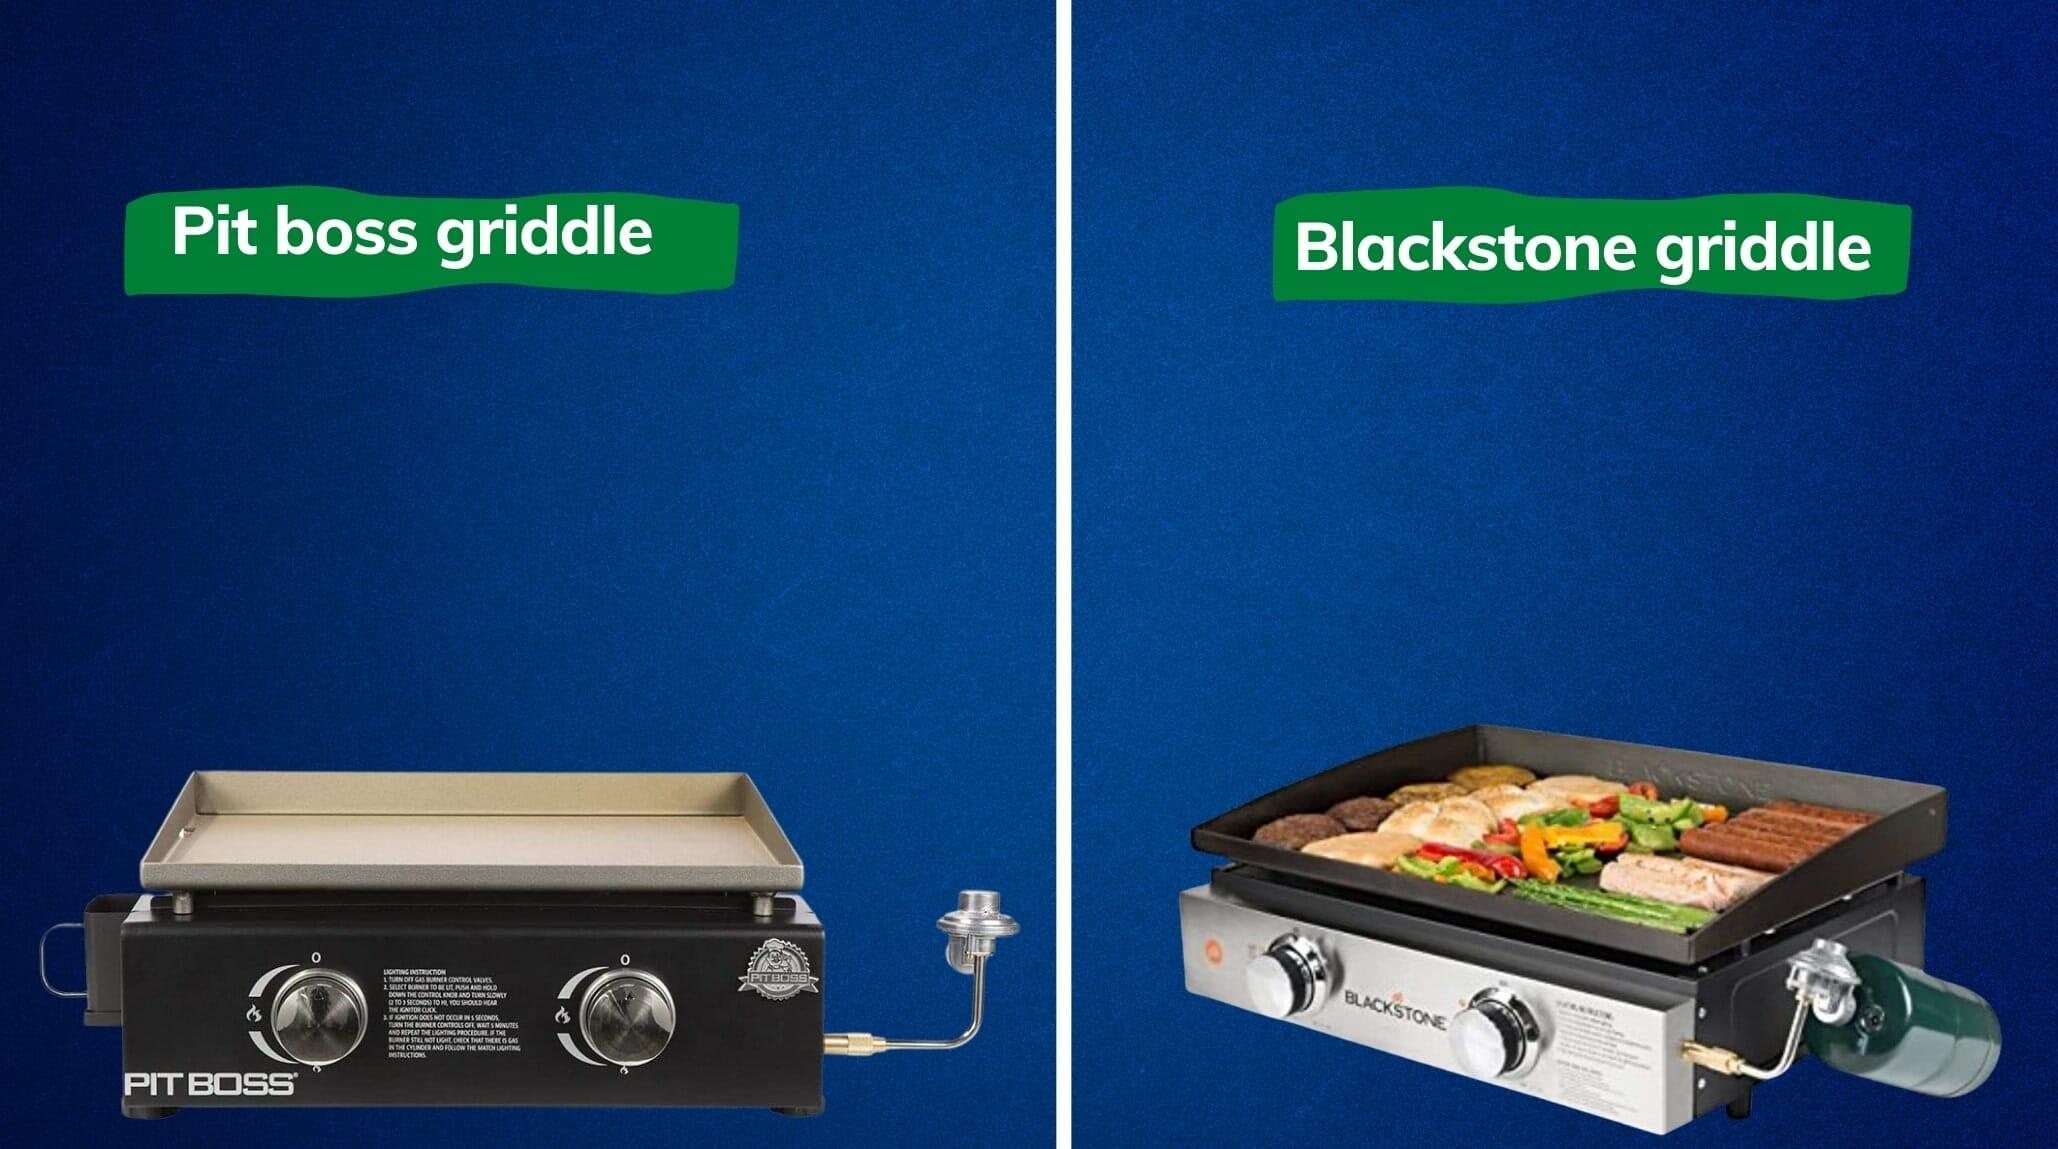 pit boss griddle vs blackstone griddle